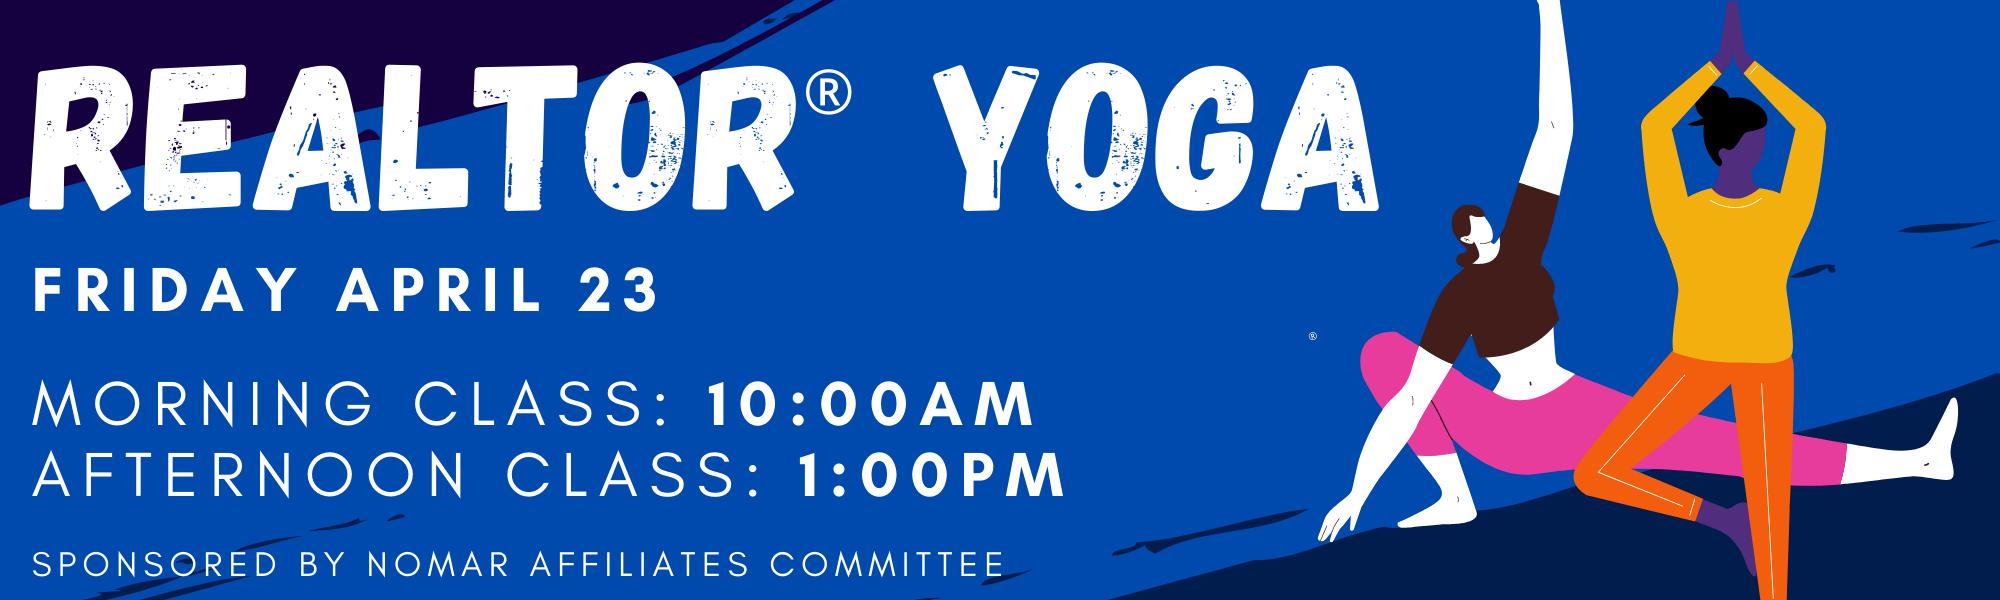 REALTOR yoga